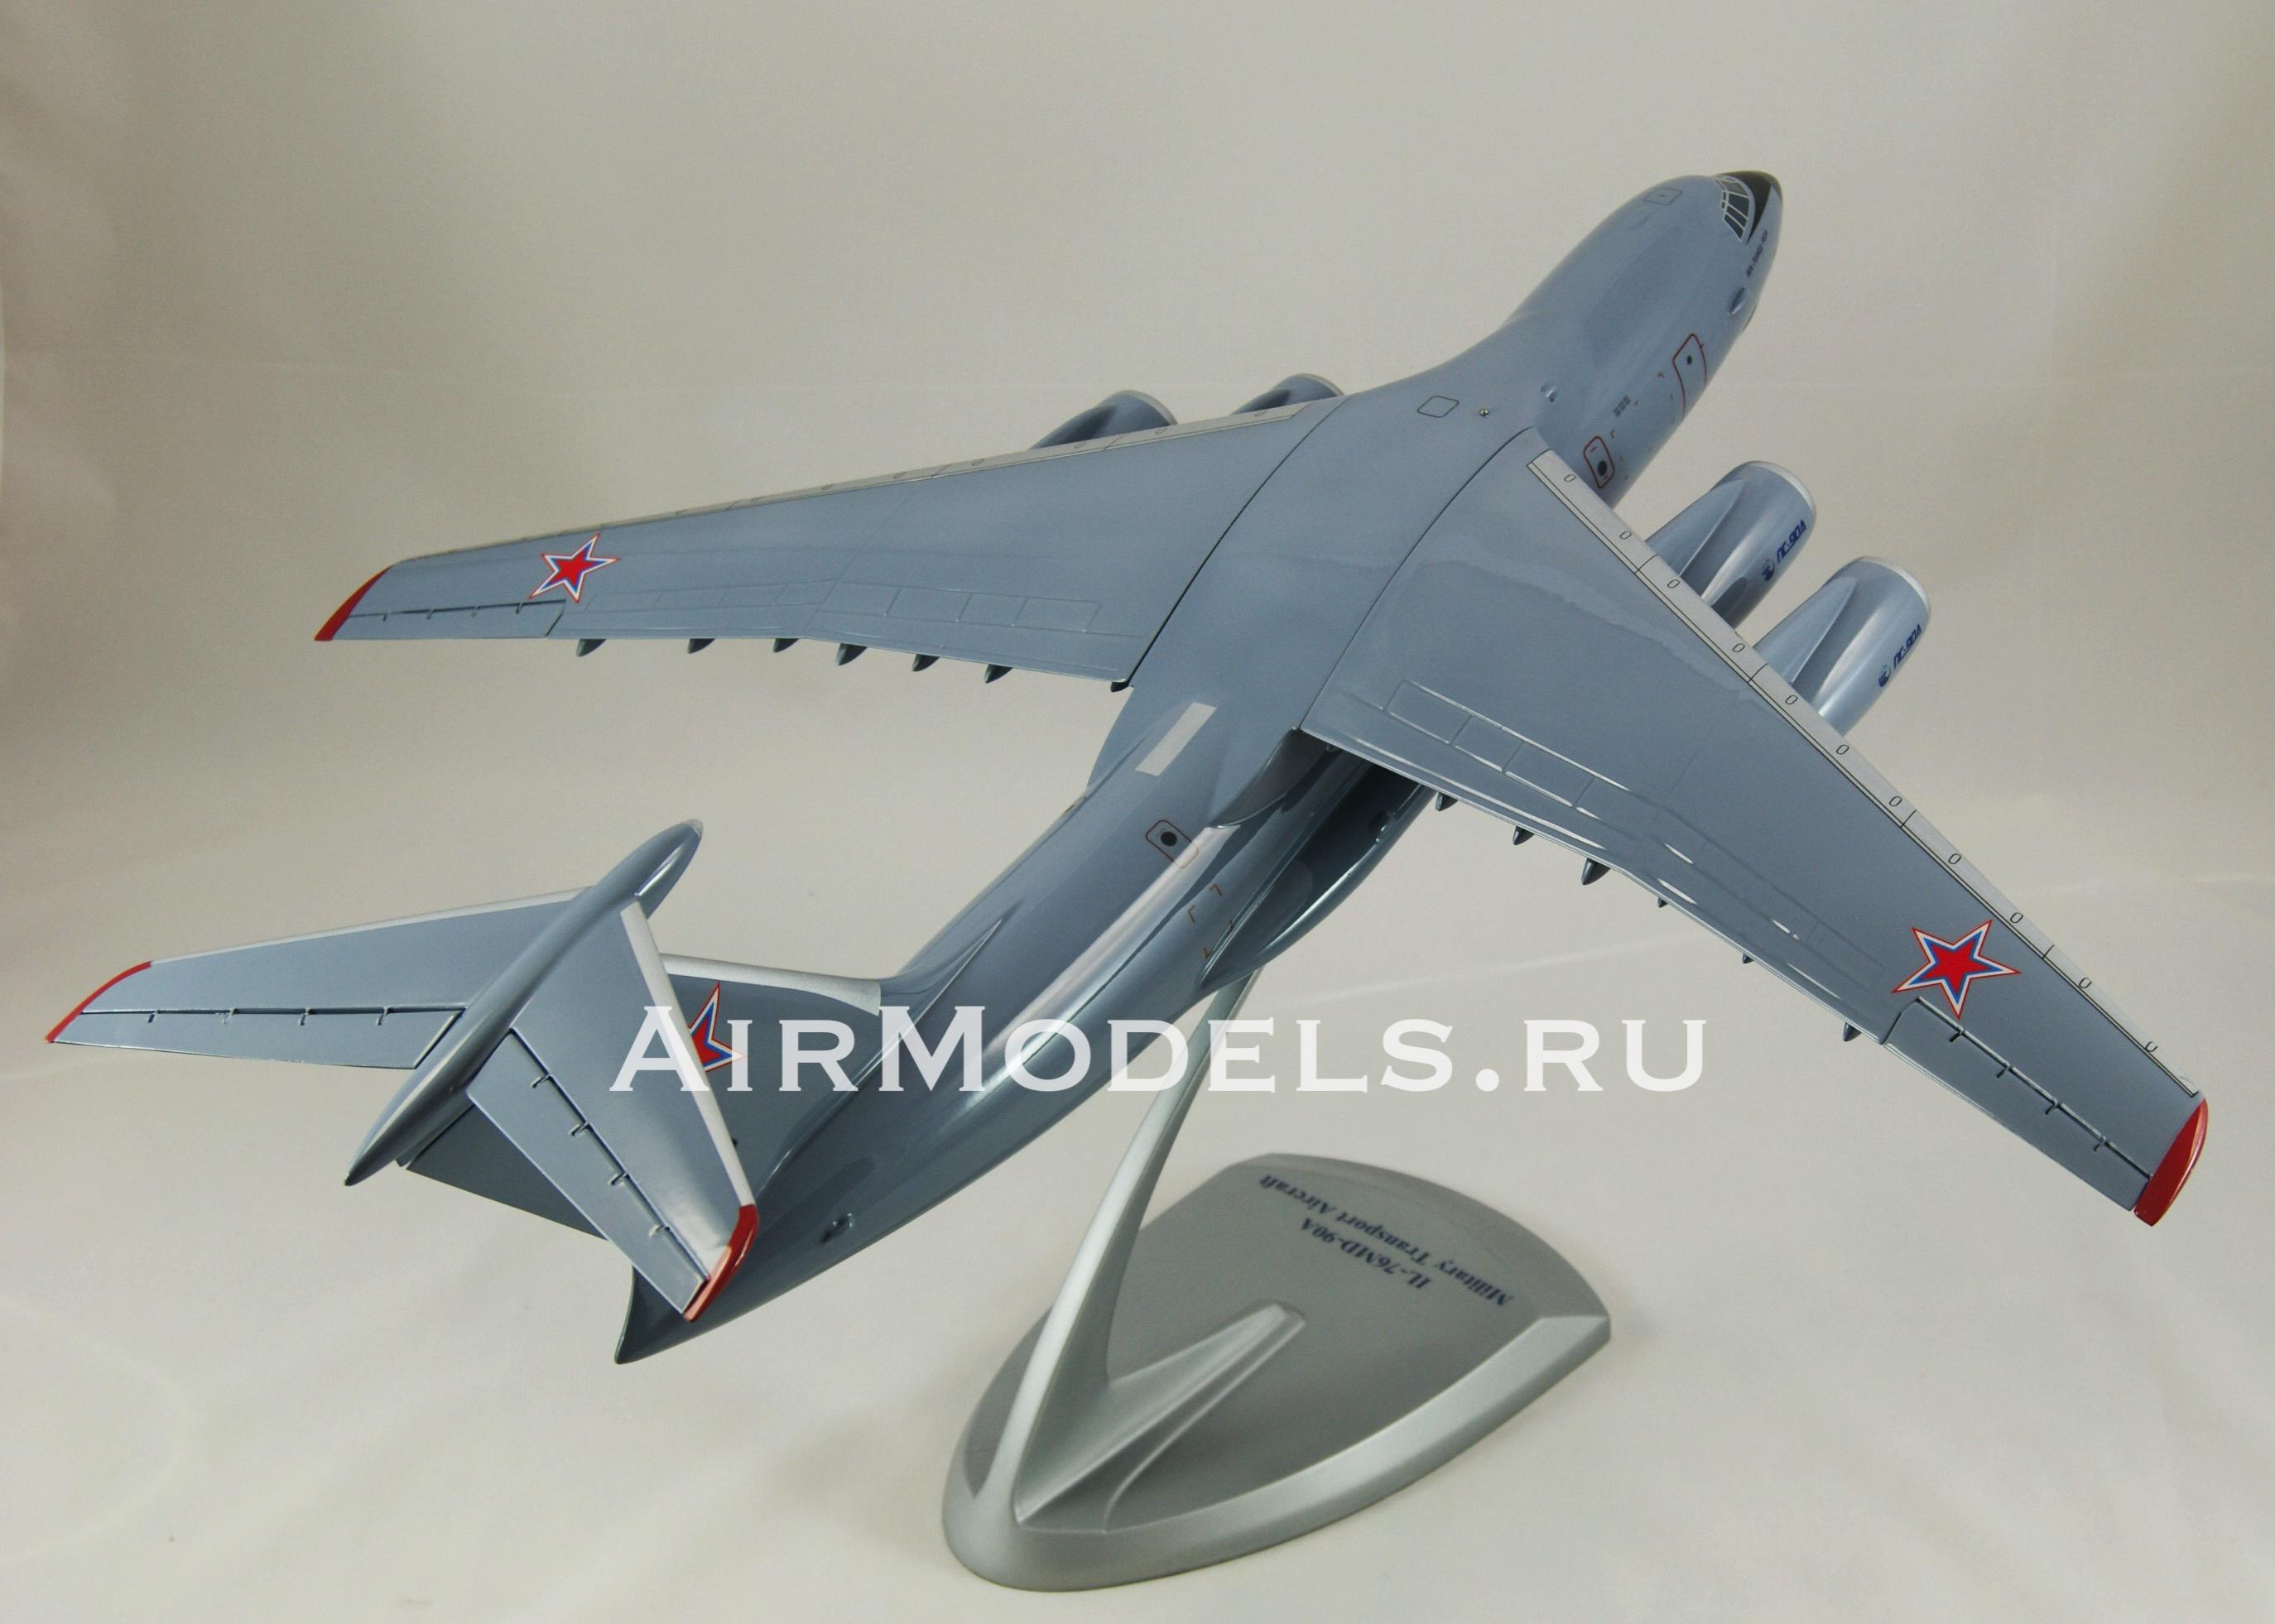 Ил-76МД-90А в масштабе 1:72